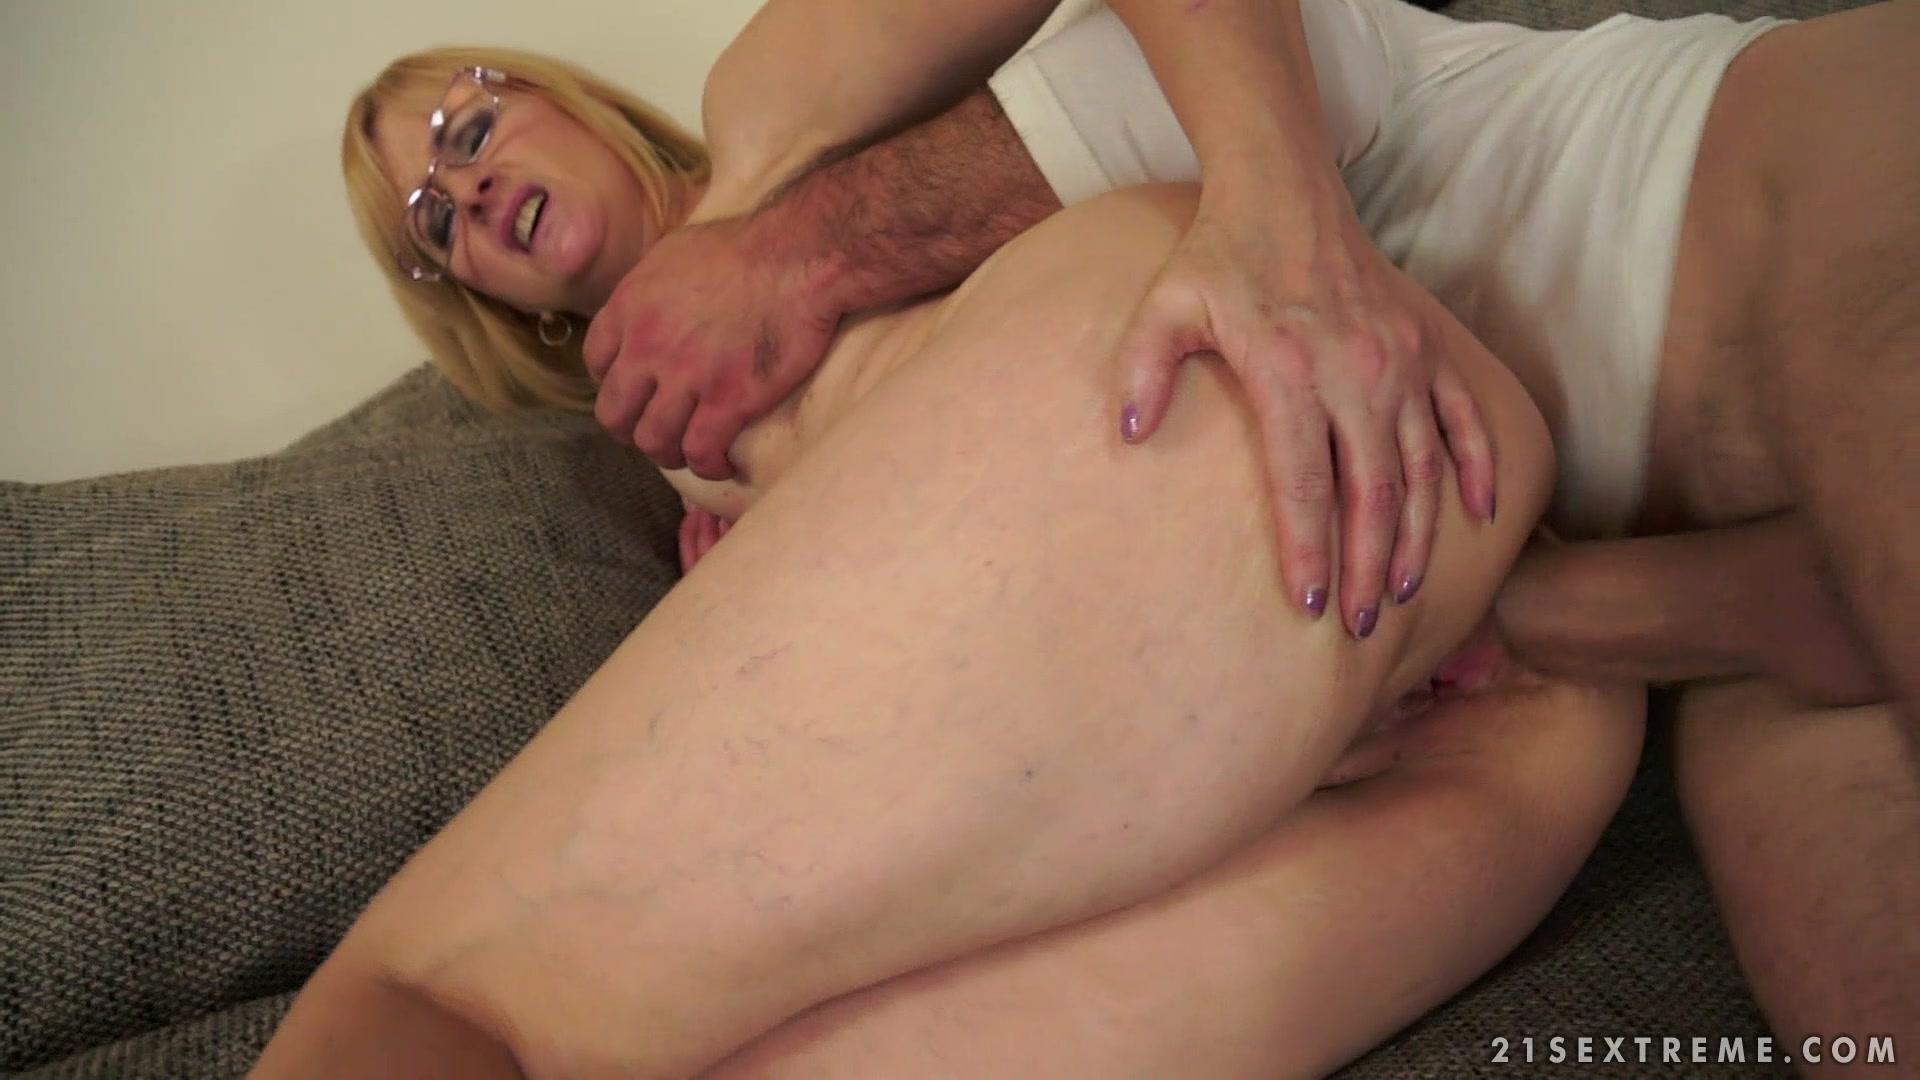 Classy nude video